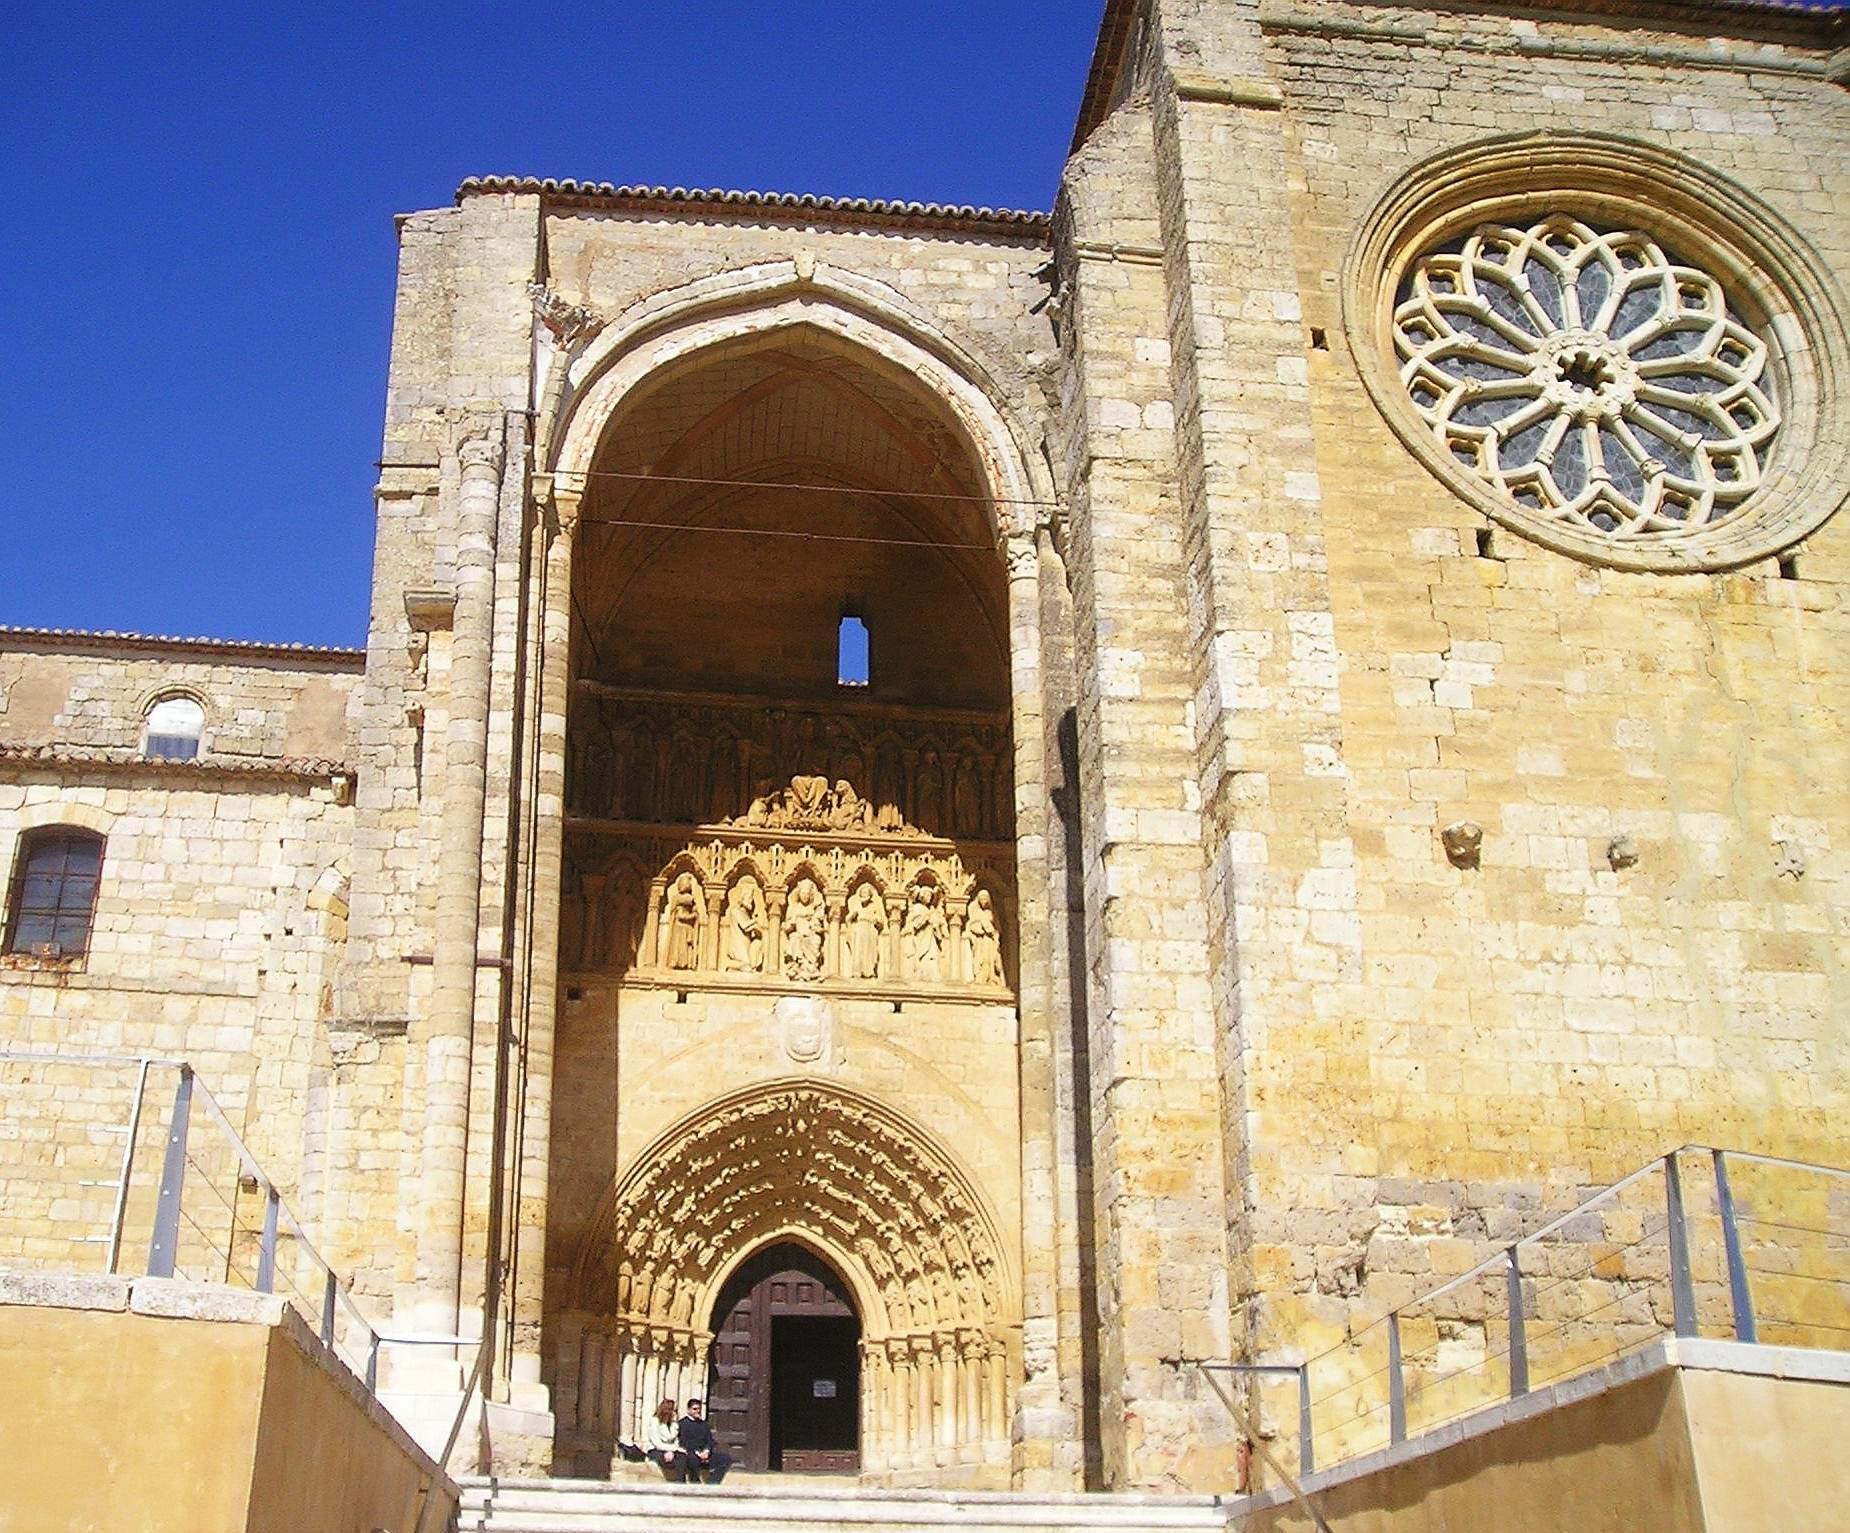 Iglesia Santa Maria la Blanca in Villalcalzar de Sirga